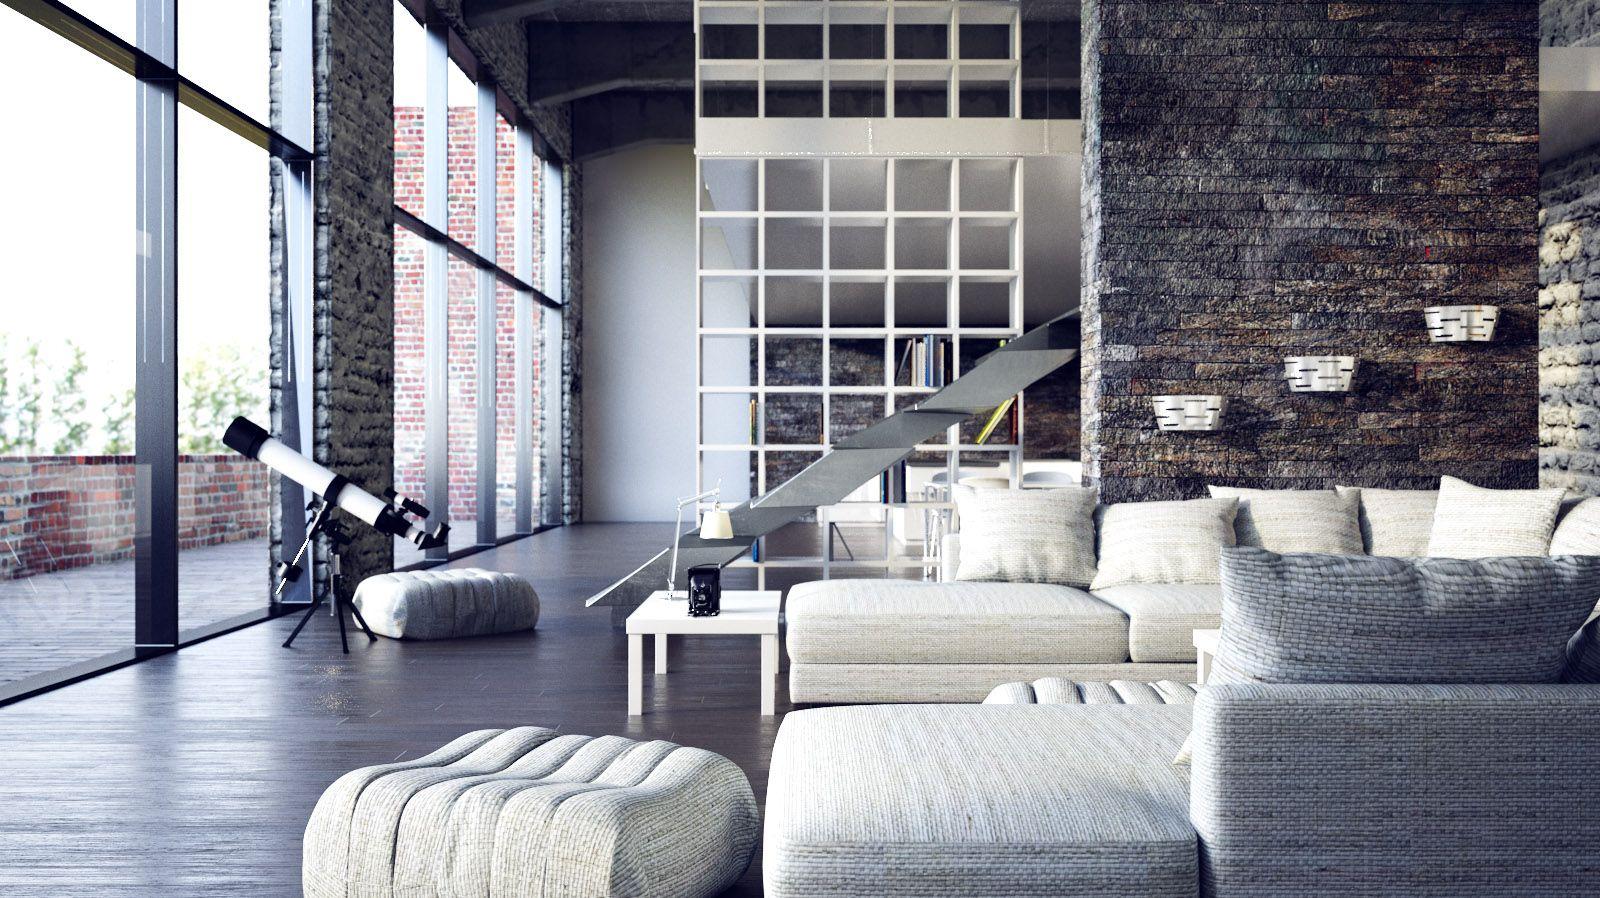 Urban Loft Design Ideas The Second Loft Space Was